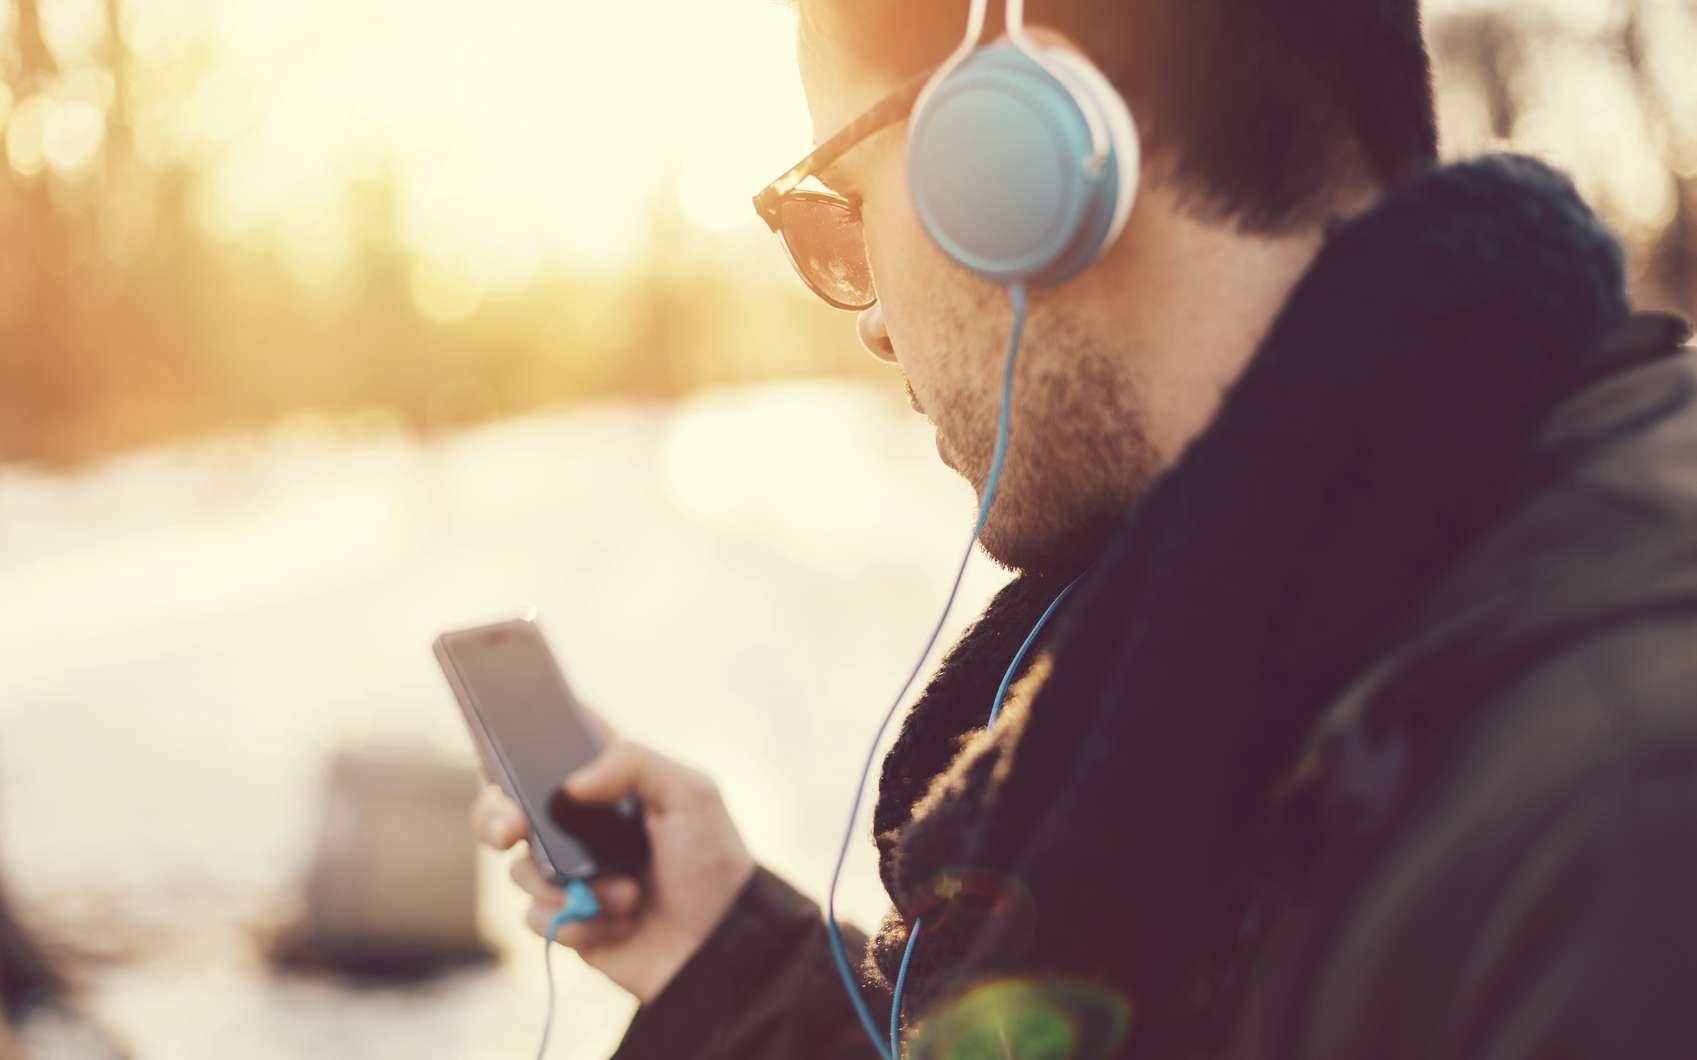 Un simple fichier audio, comme une chanson ou un podcast, peut cacher un malware. © Martin Dimitrov, Istock.com